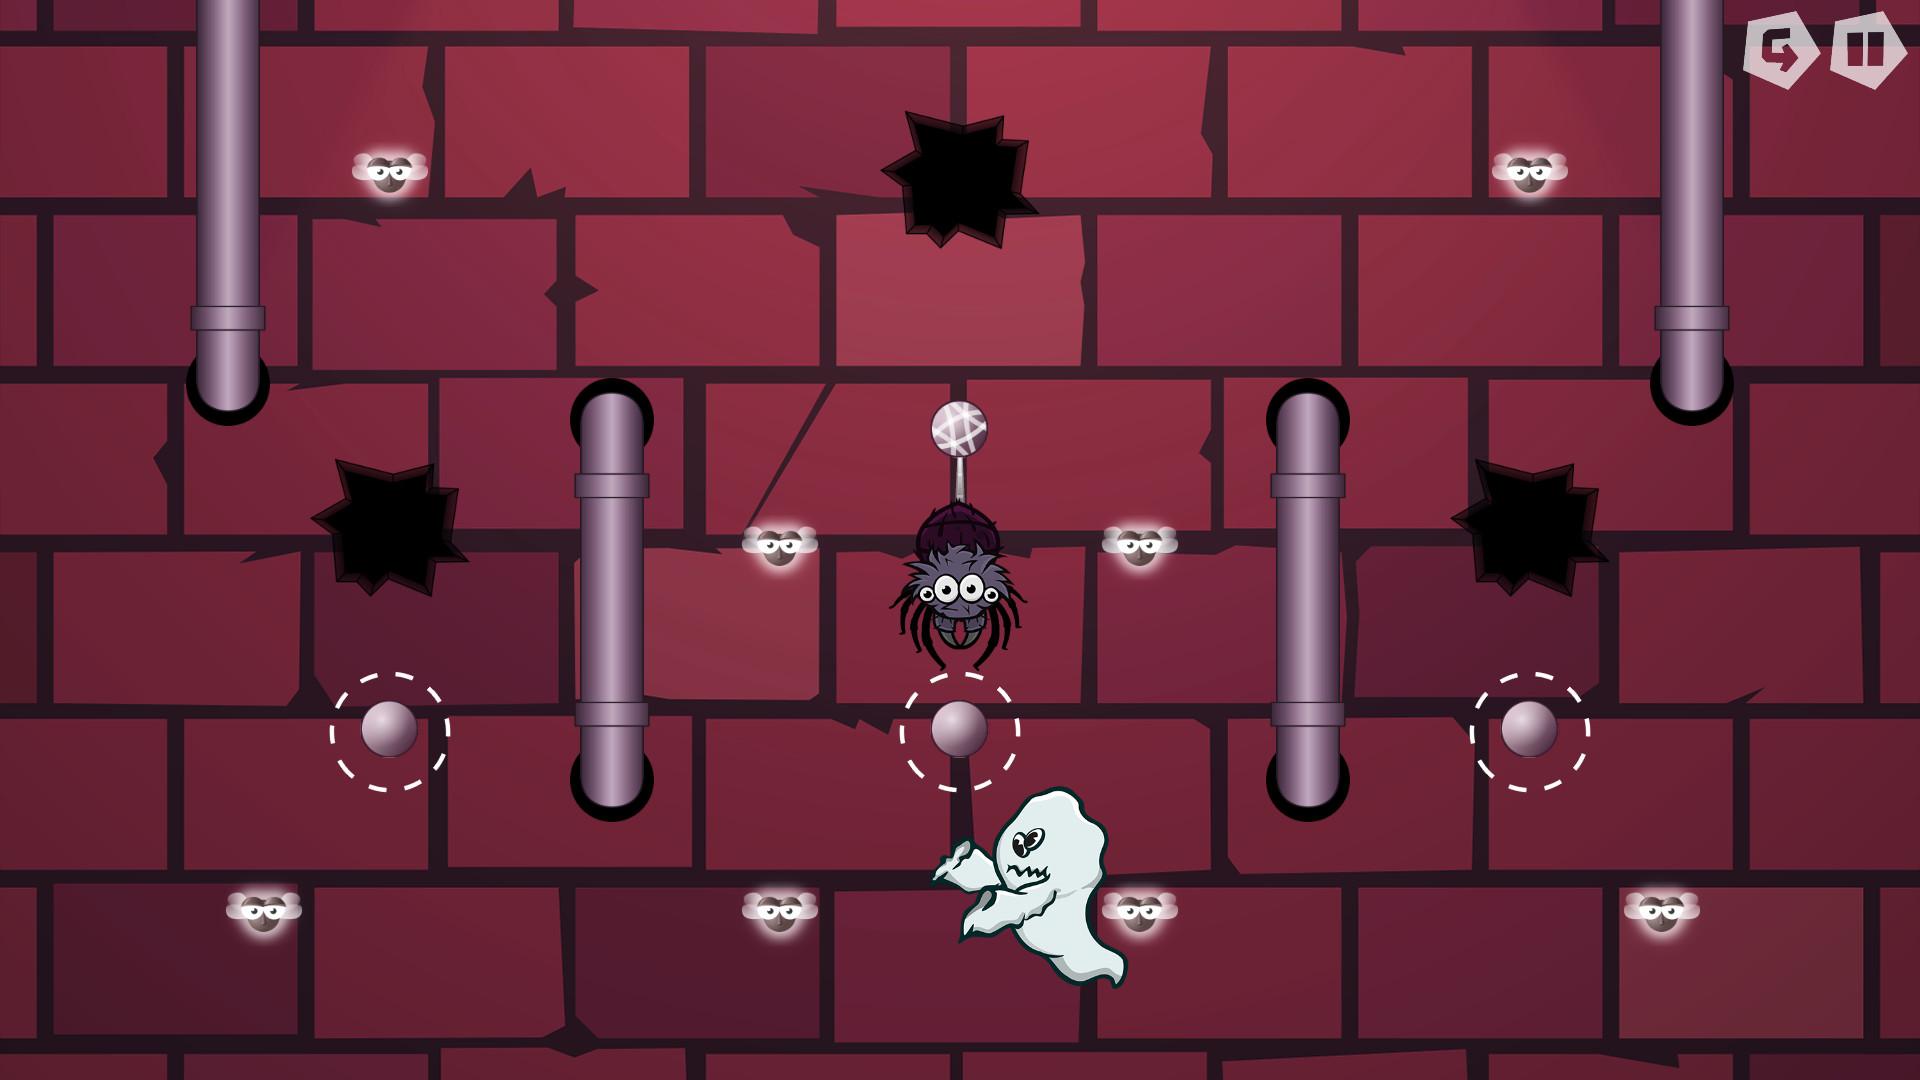 Riaaf The Spider screenshot